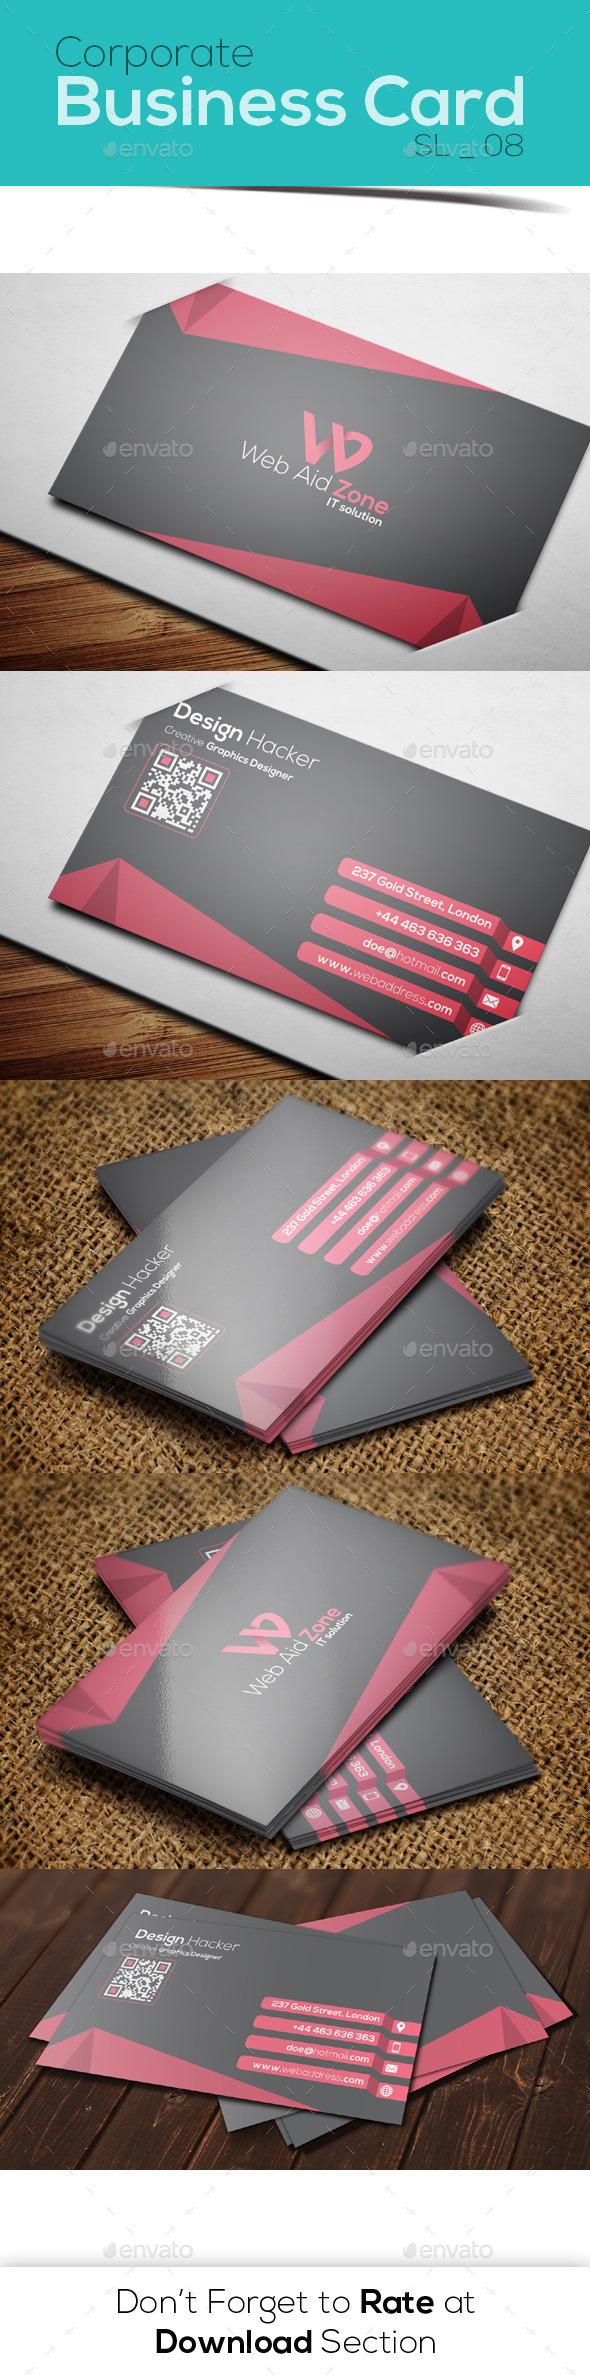 Corporate Business Card 08 - Corporate Business Cards